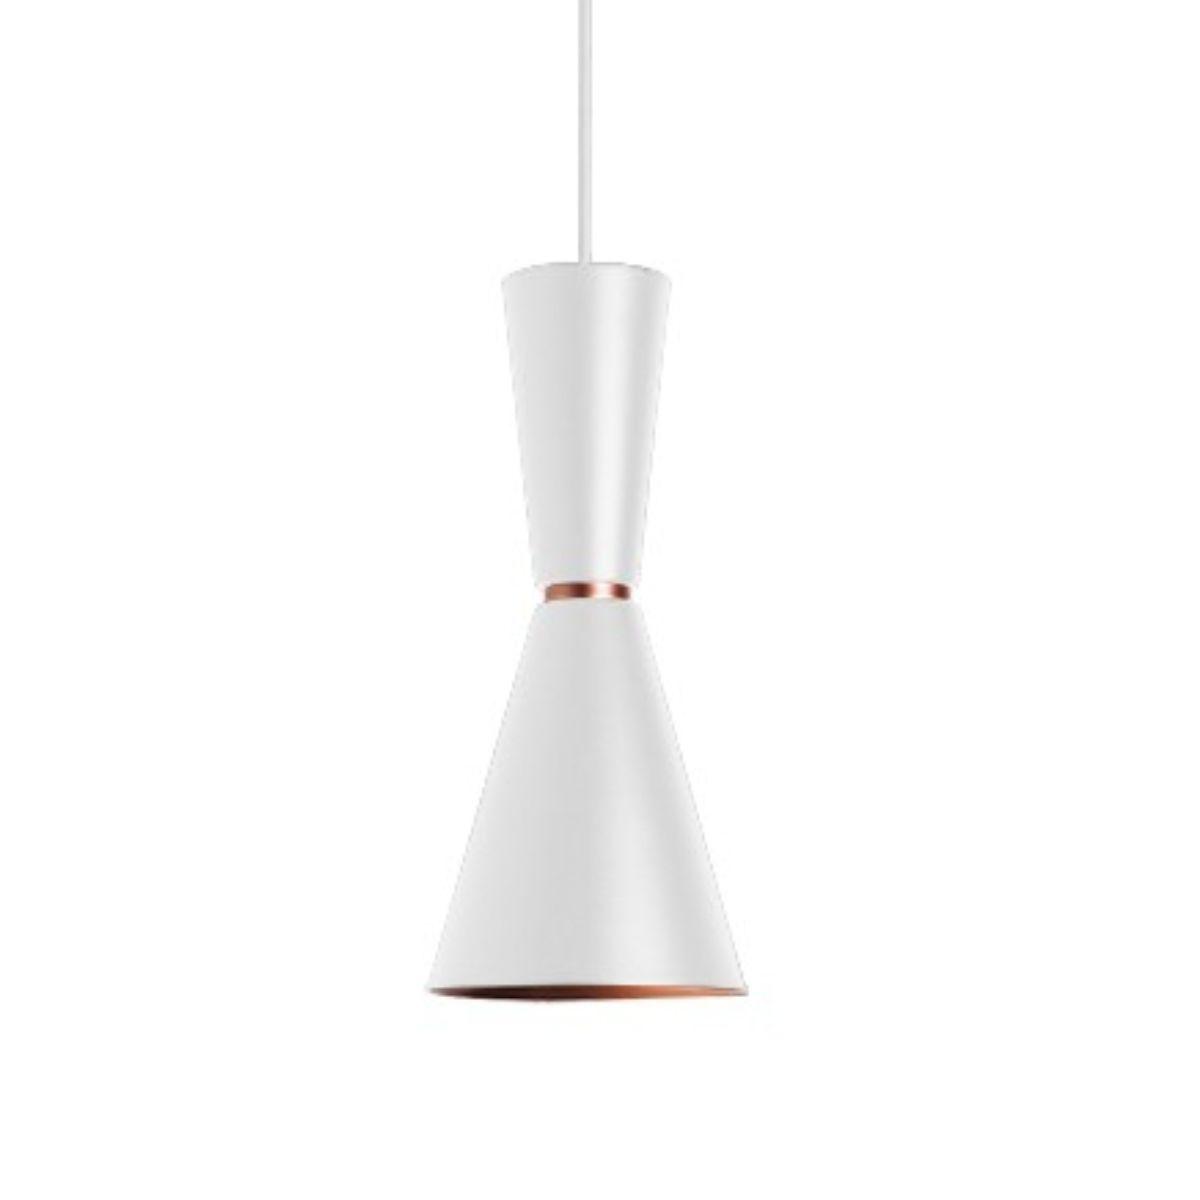 Pendente Alumínio Branco/Cobre - Bambola 41cm Cozinha/Bancada